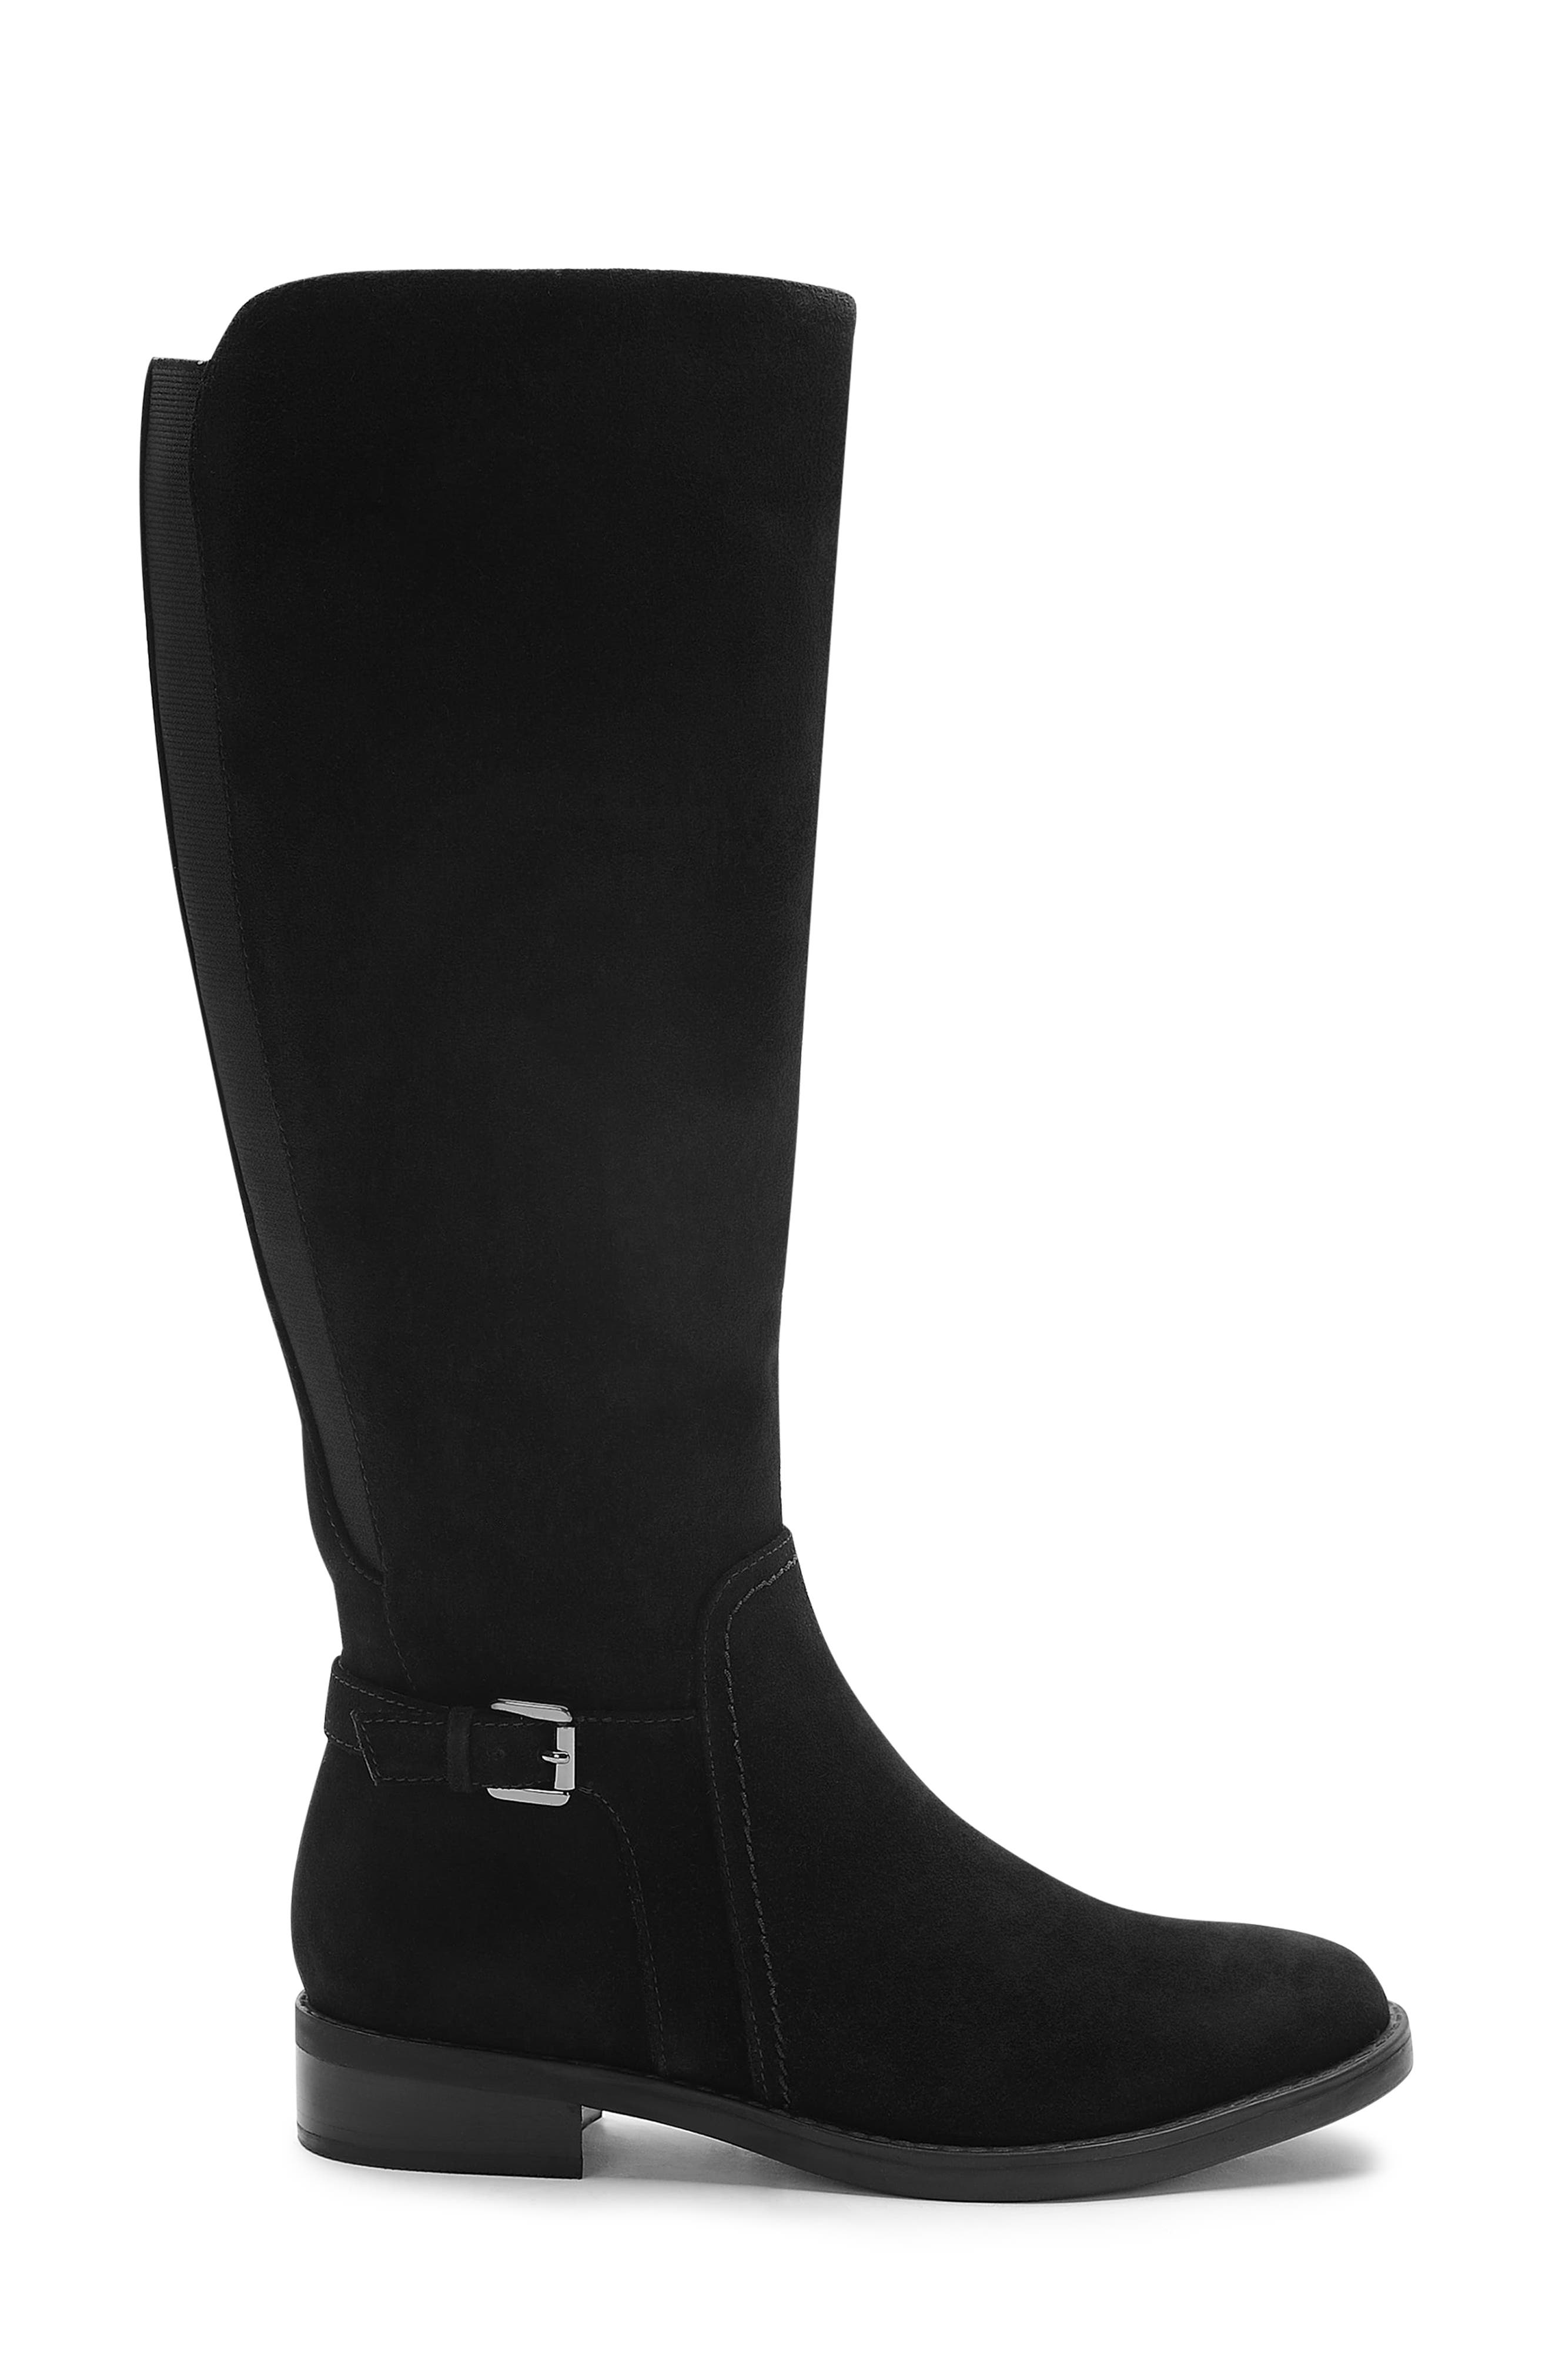 Evie Riding Boot,                             Alternate thumbnail 3, color,                             BLACK SUEDE